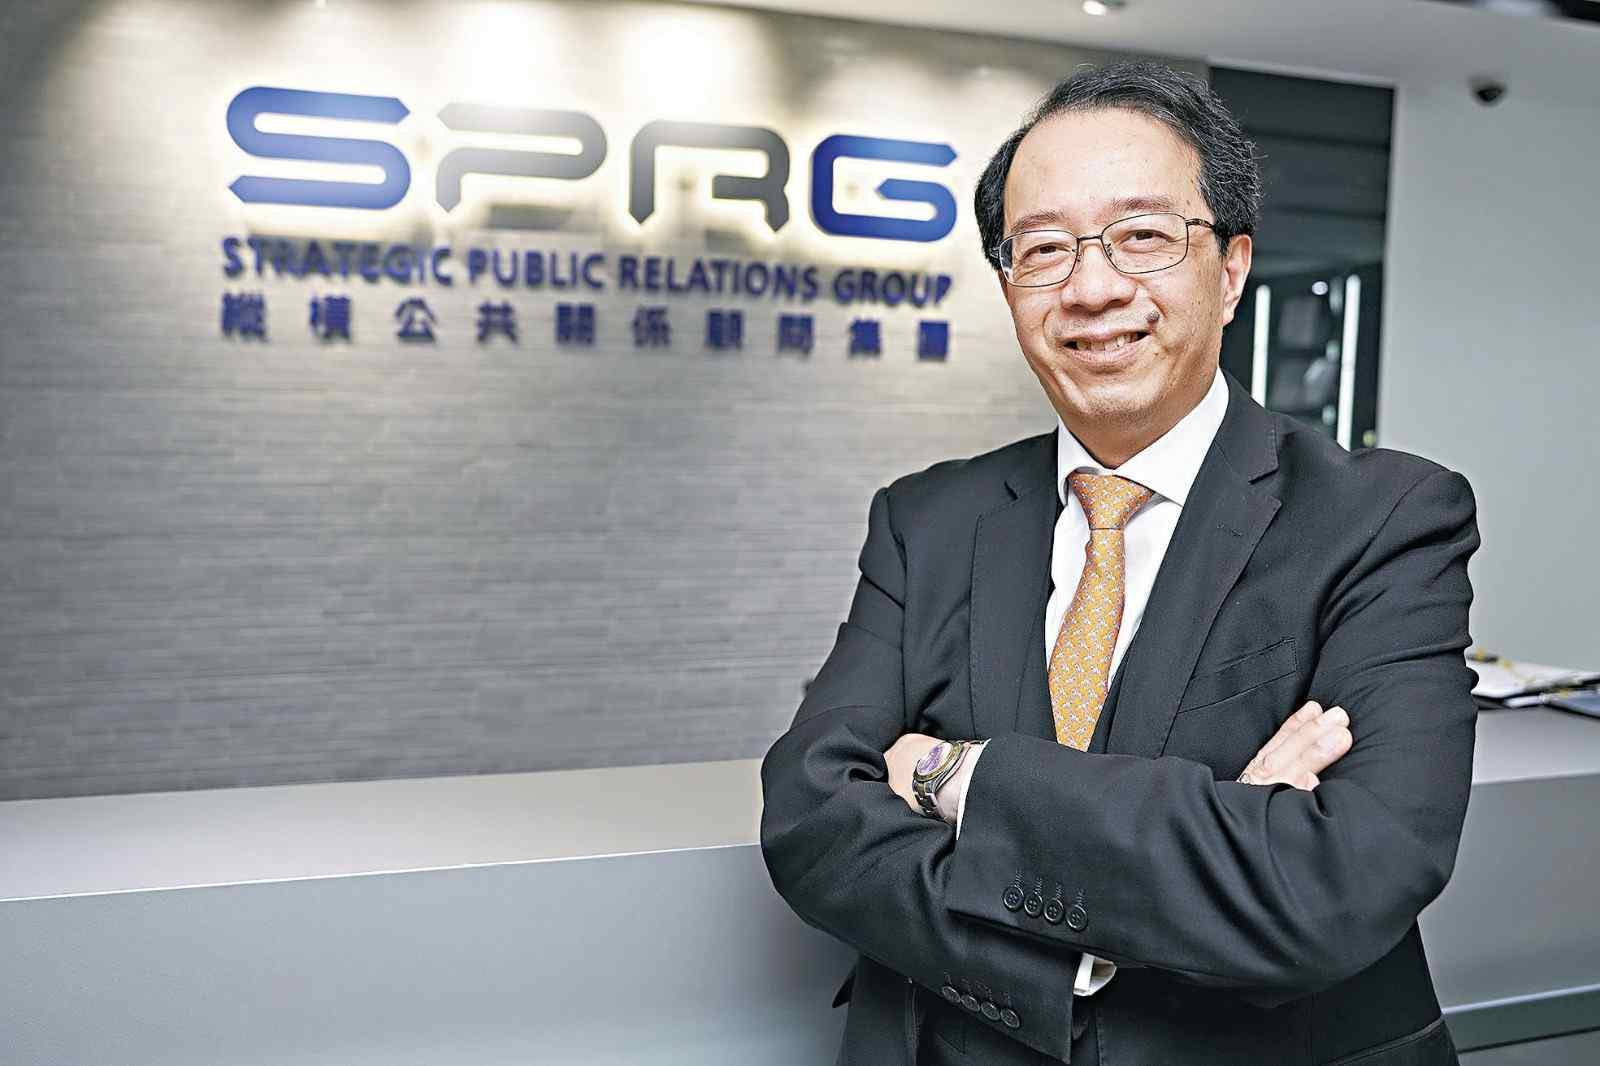 SPRG主席曾立基深信,跟客戶建立長久關係 是財經公關工作的重要一環。